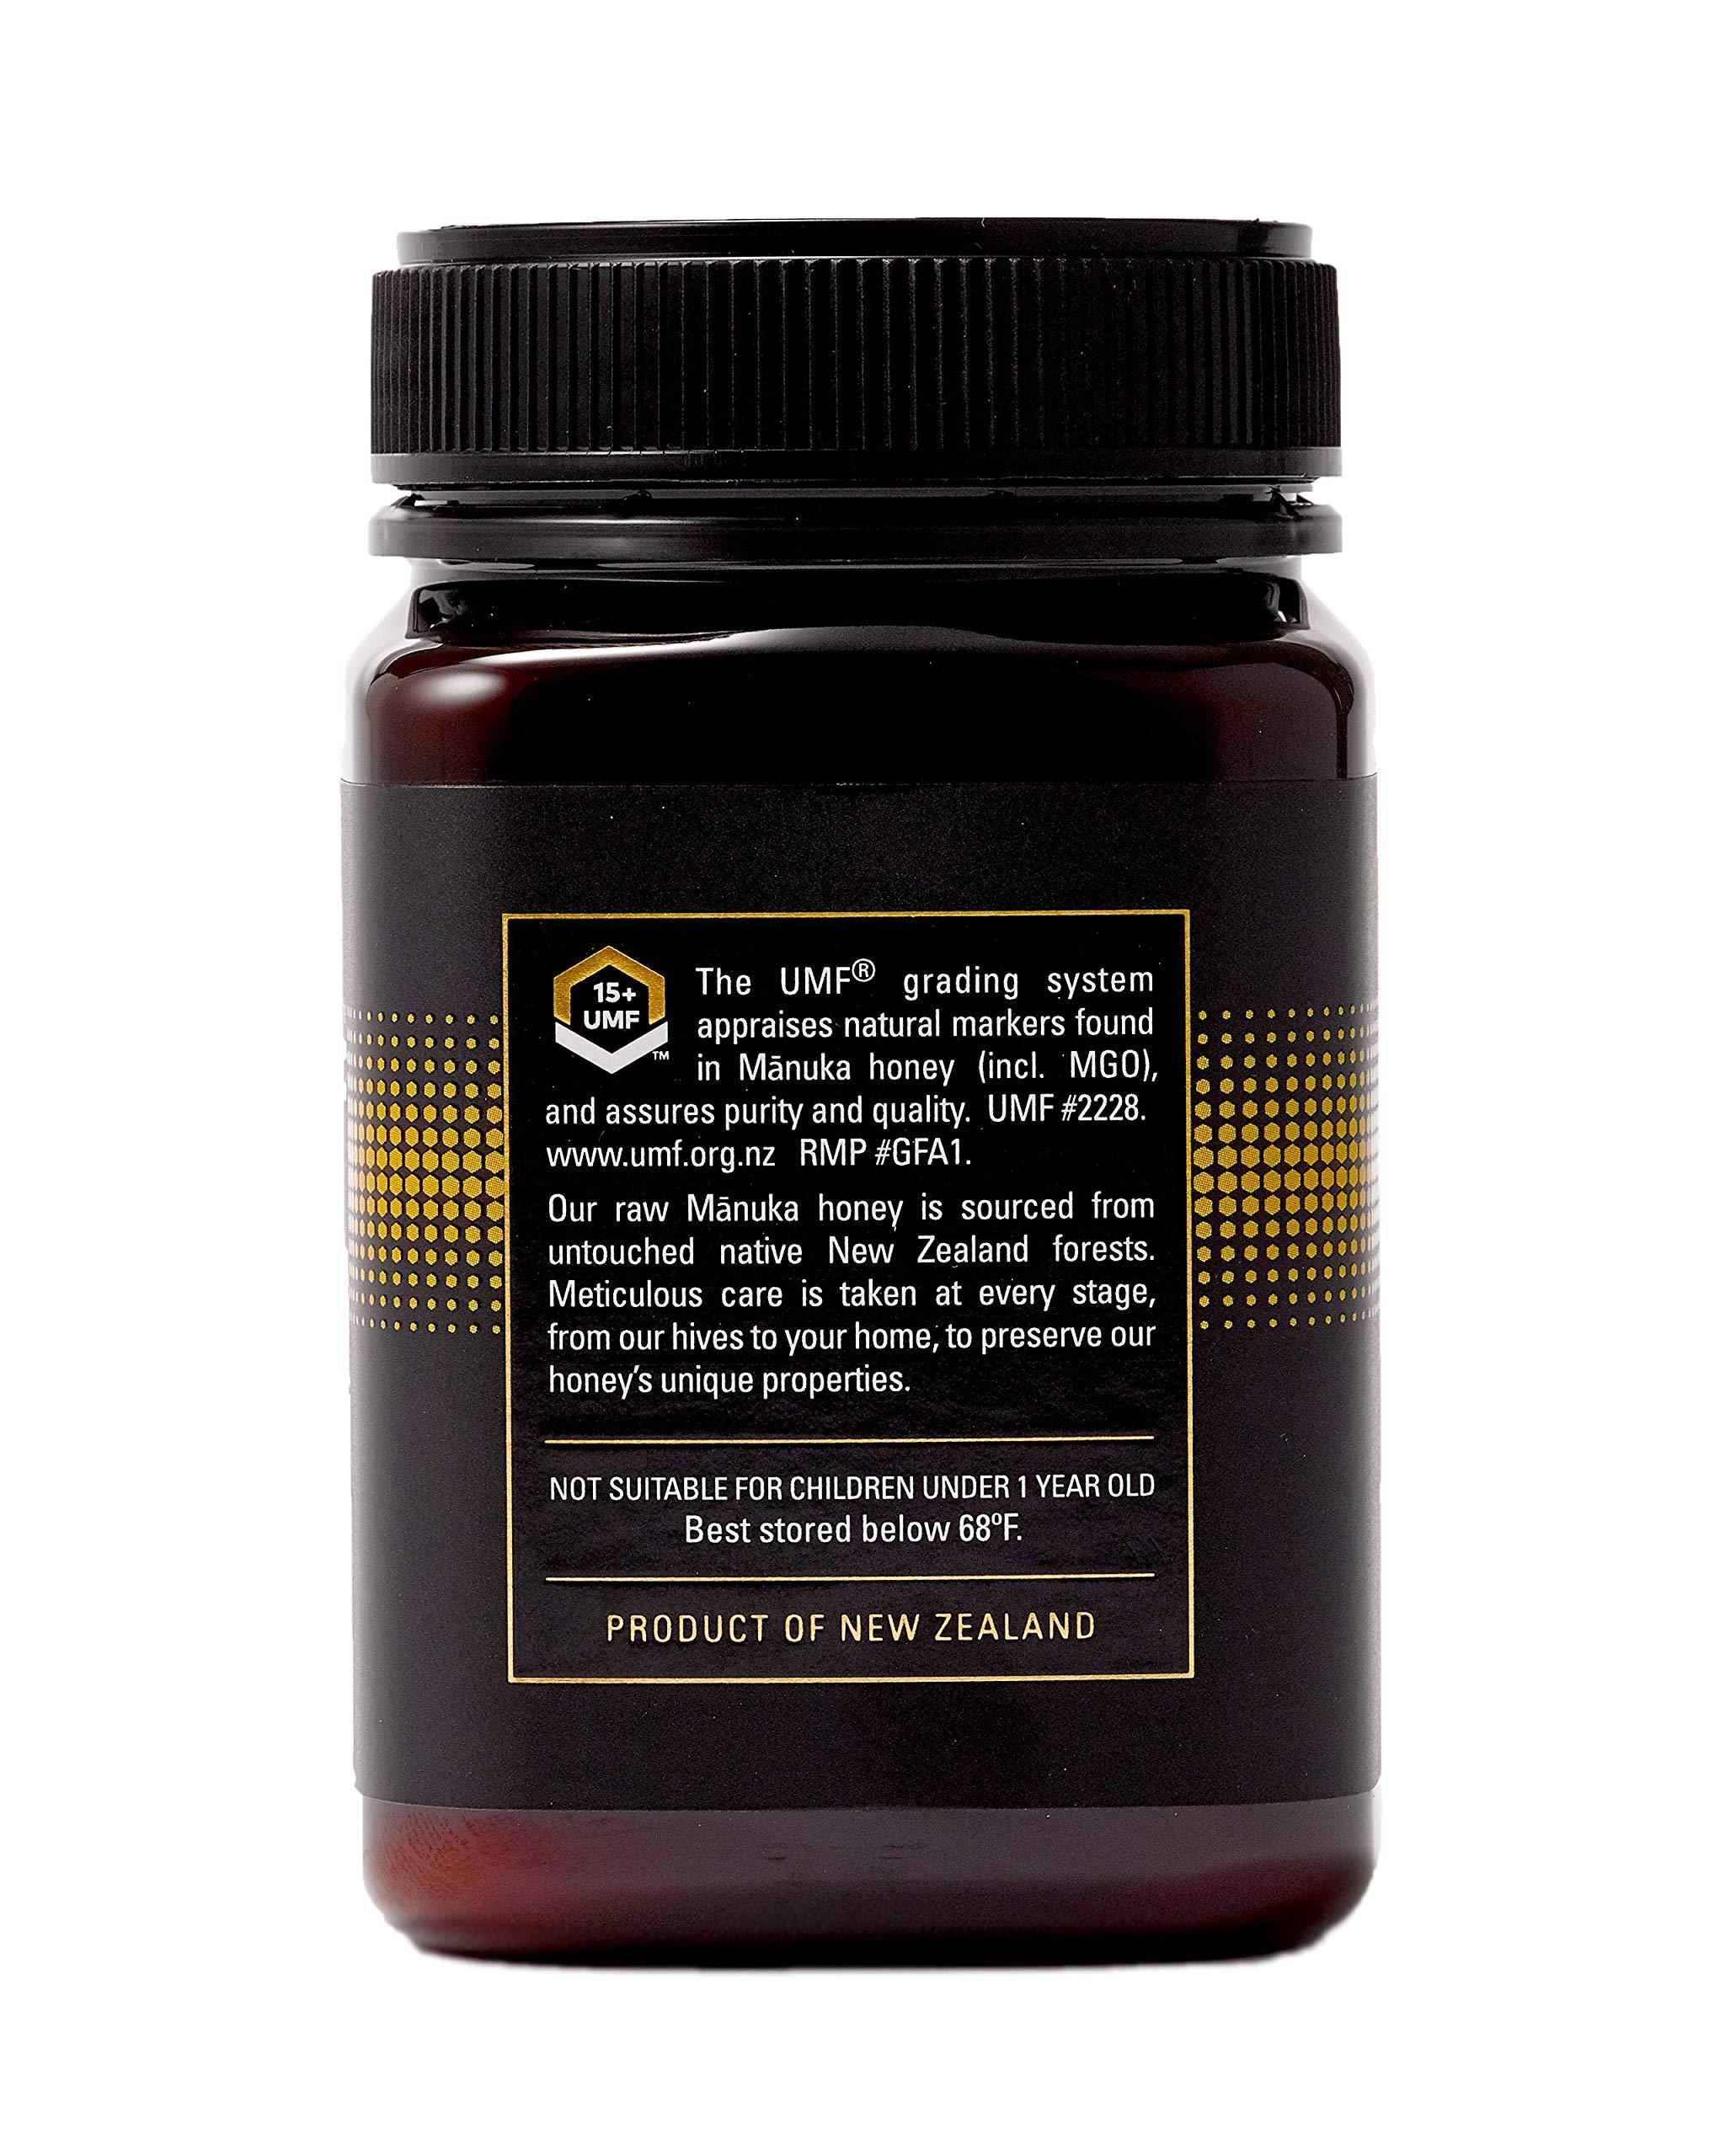 Manukora UMF 15+/MGO 500+ Raw Mānuka Honey (500g/1.1lb) Authentic Non-GMO New Zealand Honey, UMF & MGO Certified, Traceable from Hive to Hand by Manukora (Image #3)